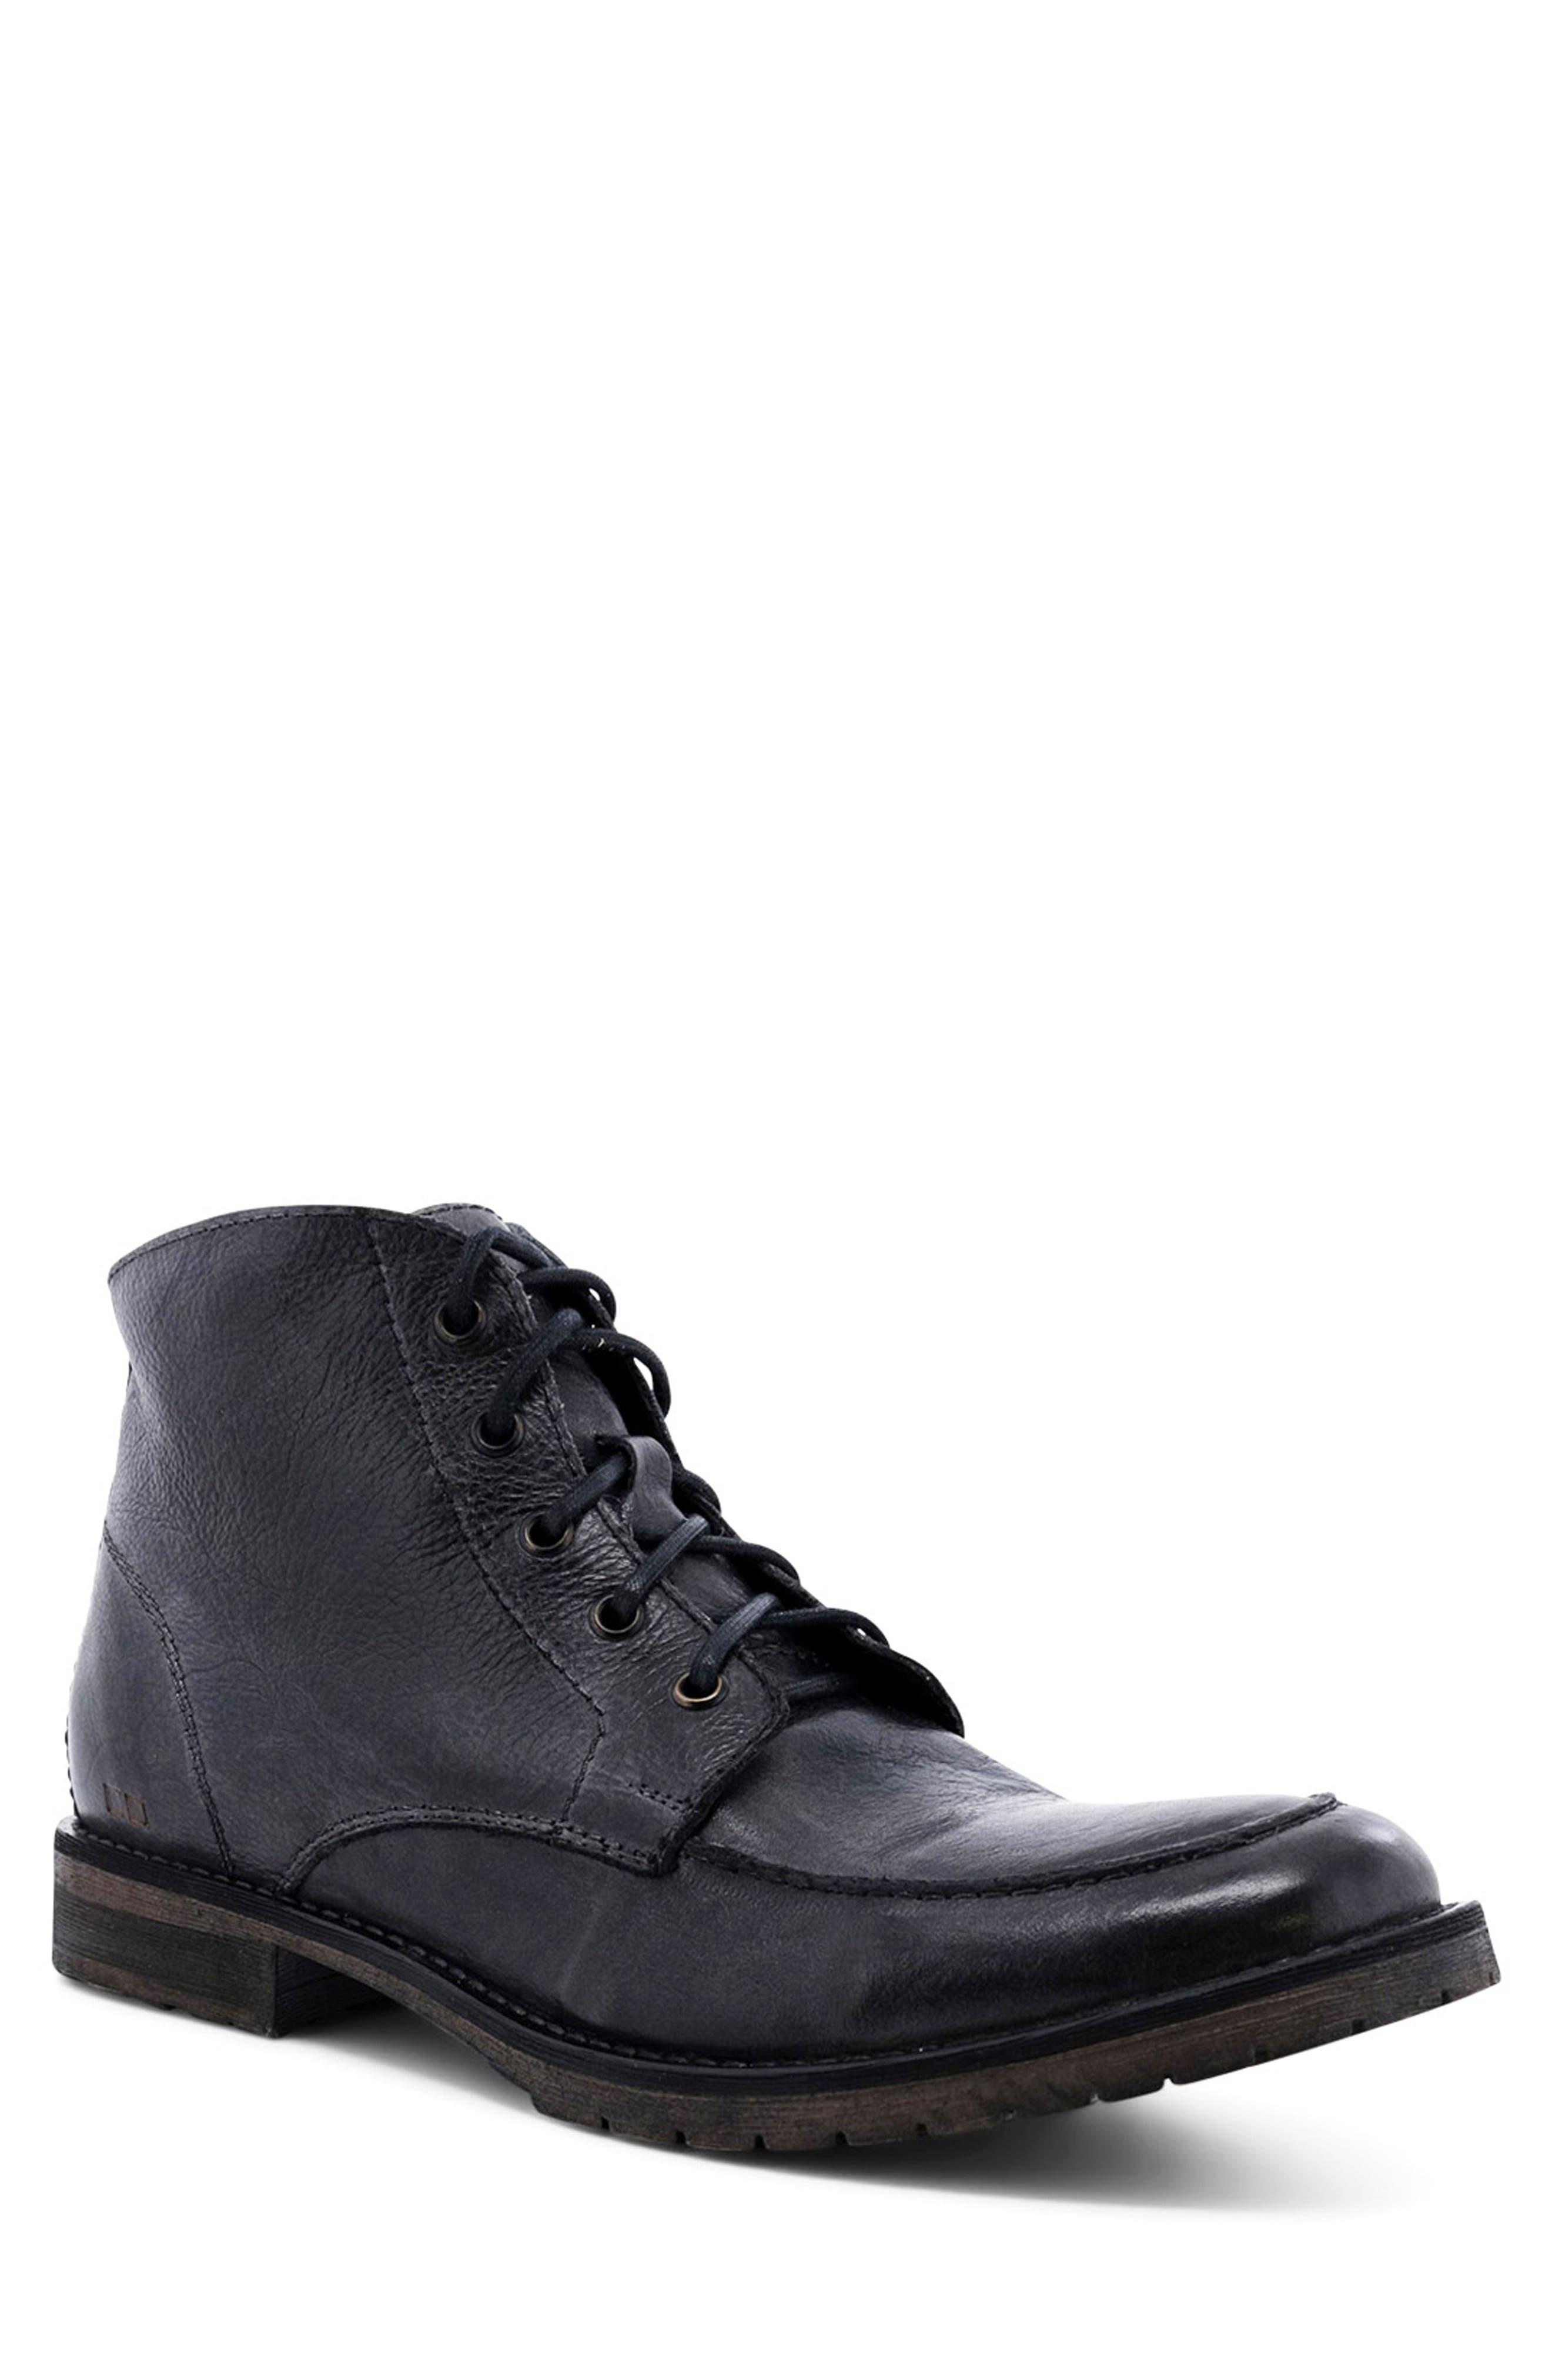 Curtis Ii Moc Toe Boot